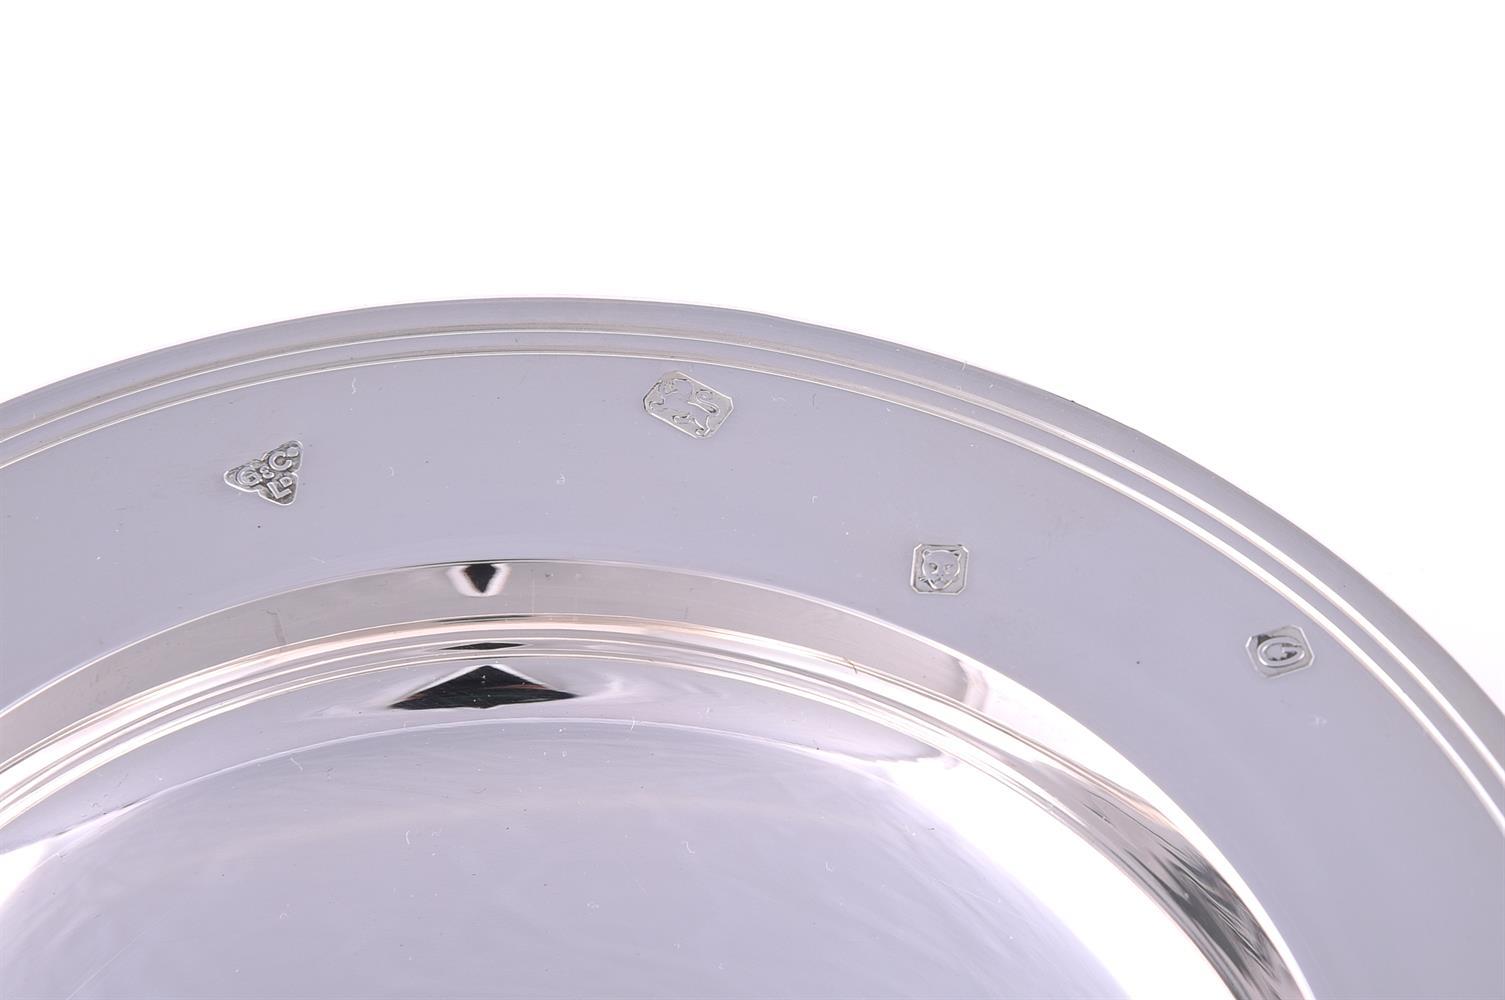 A silver armada dish by Garrard & Co. - Image 2 of 3